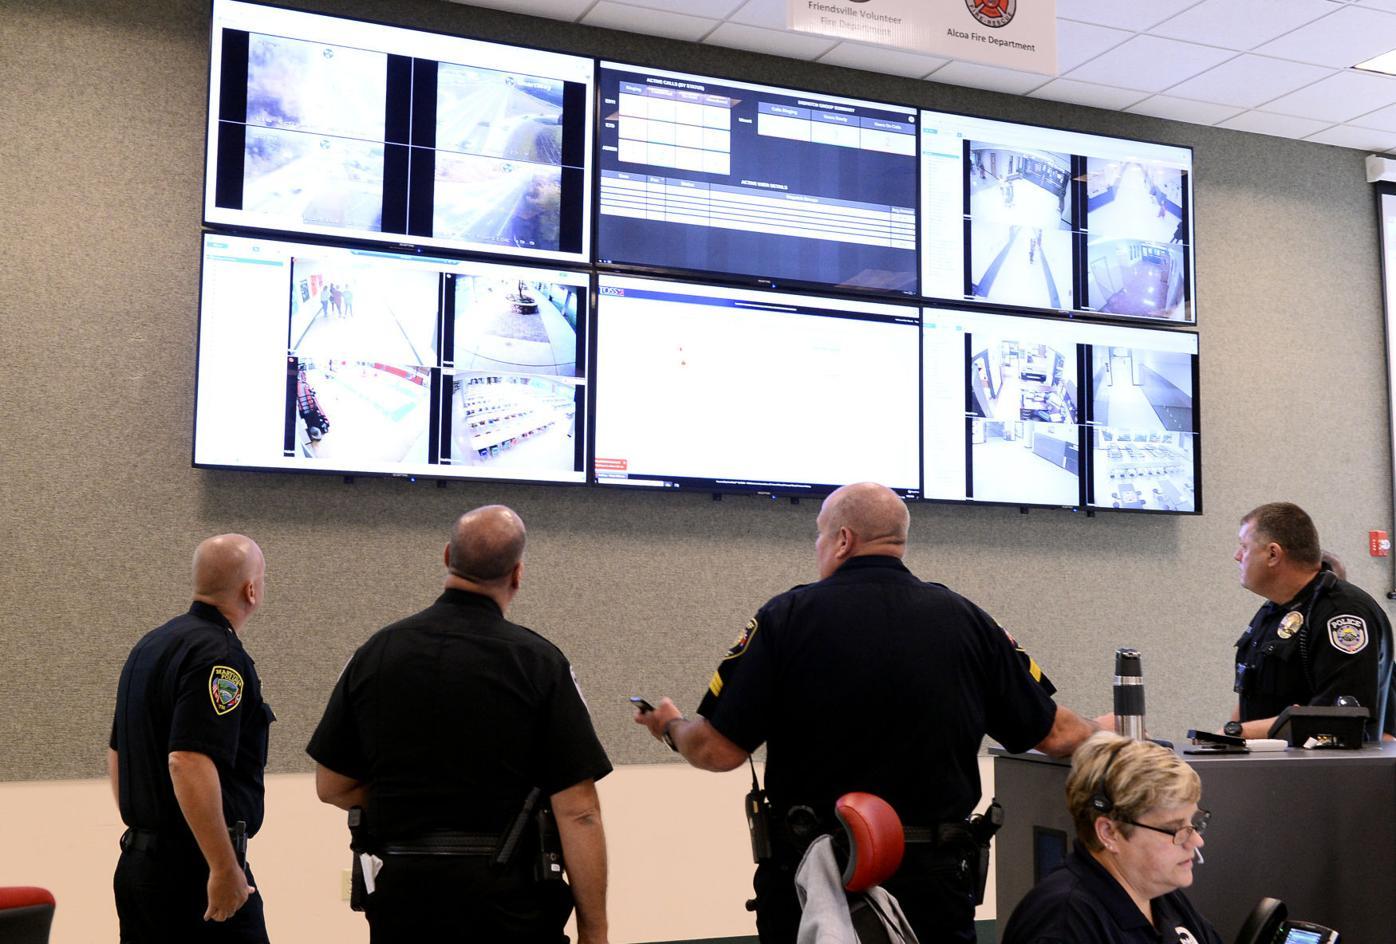 School resource officers review school emergency operation plan dashboard